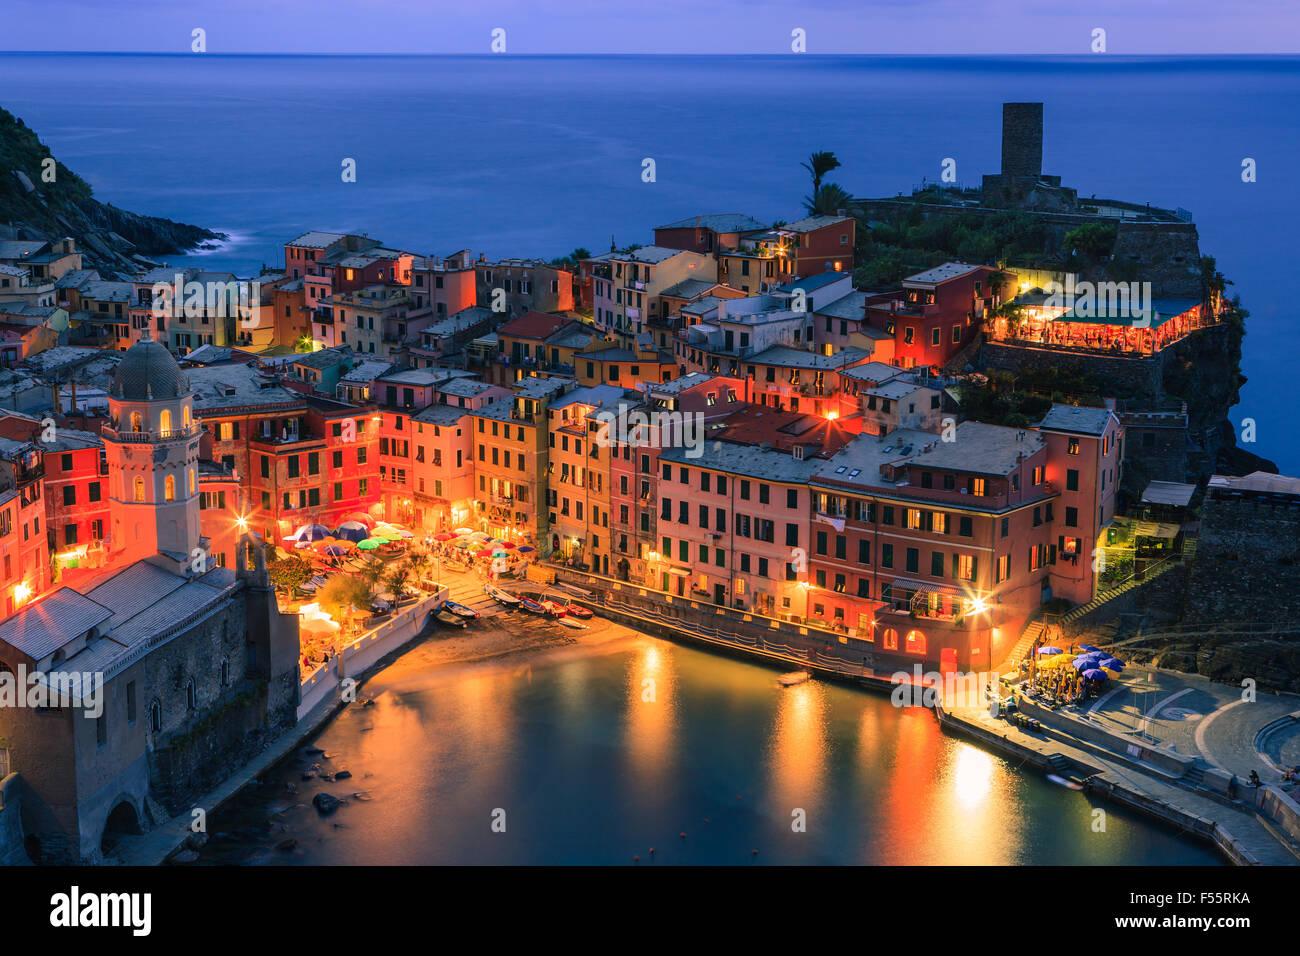 Vernazza (Latin: Vulnetia) is a town and commune located in the province of La Spezia, Liguria, northwestern Italy. Stock Photo